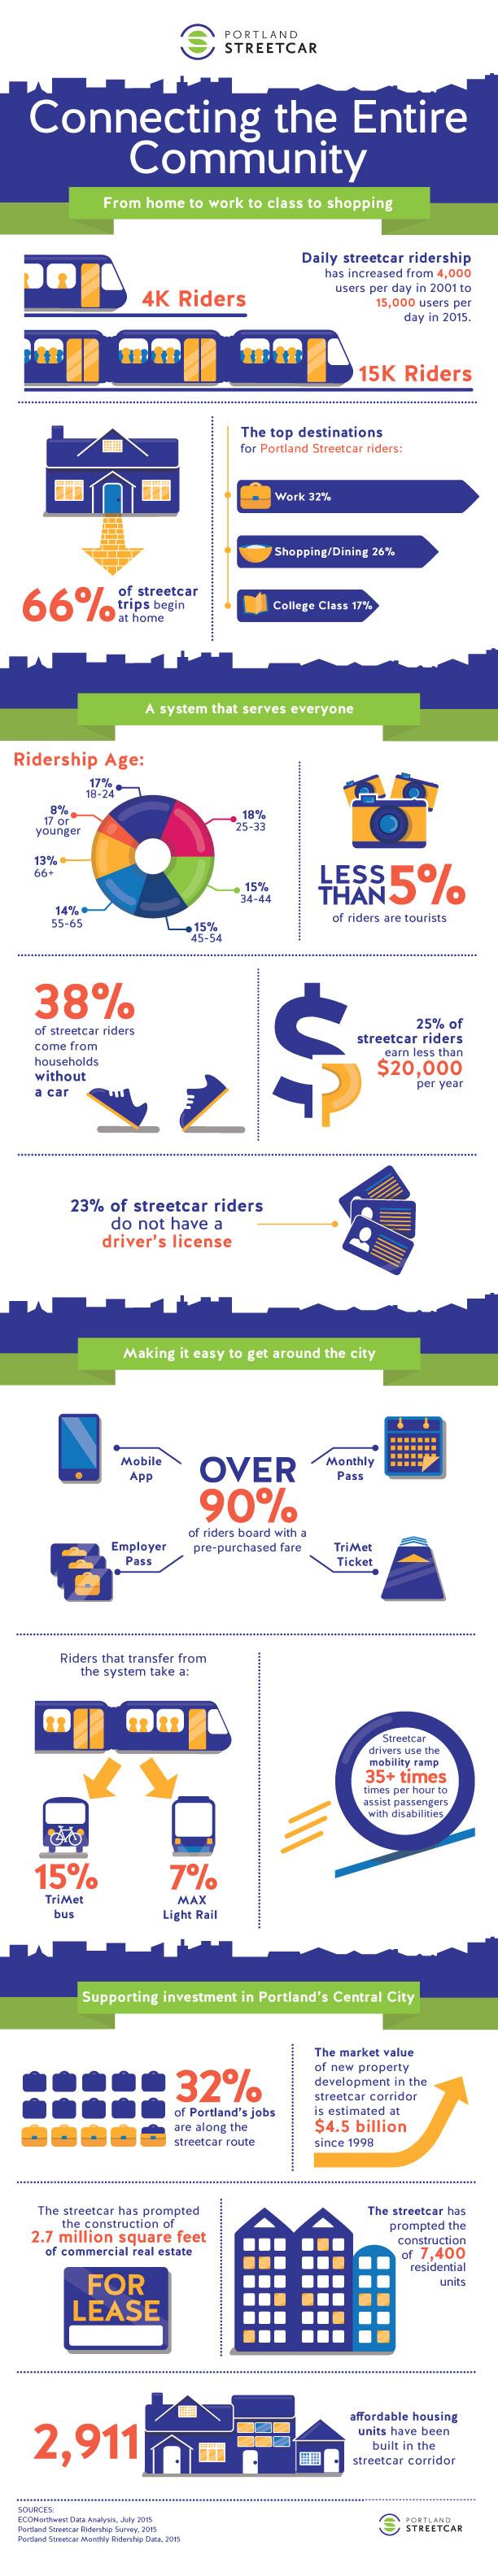 Who Rides the Portland Streetcar?